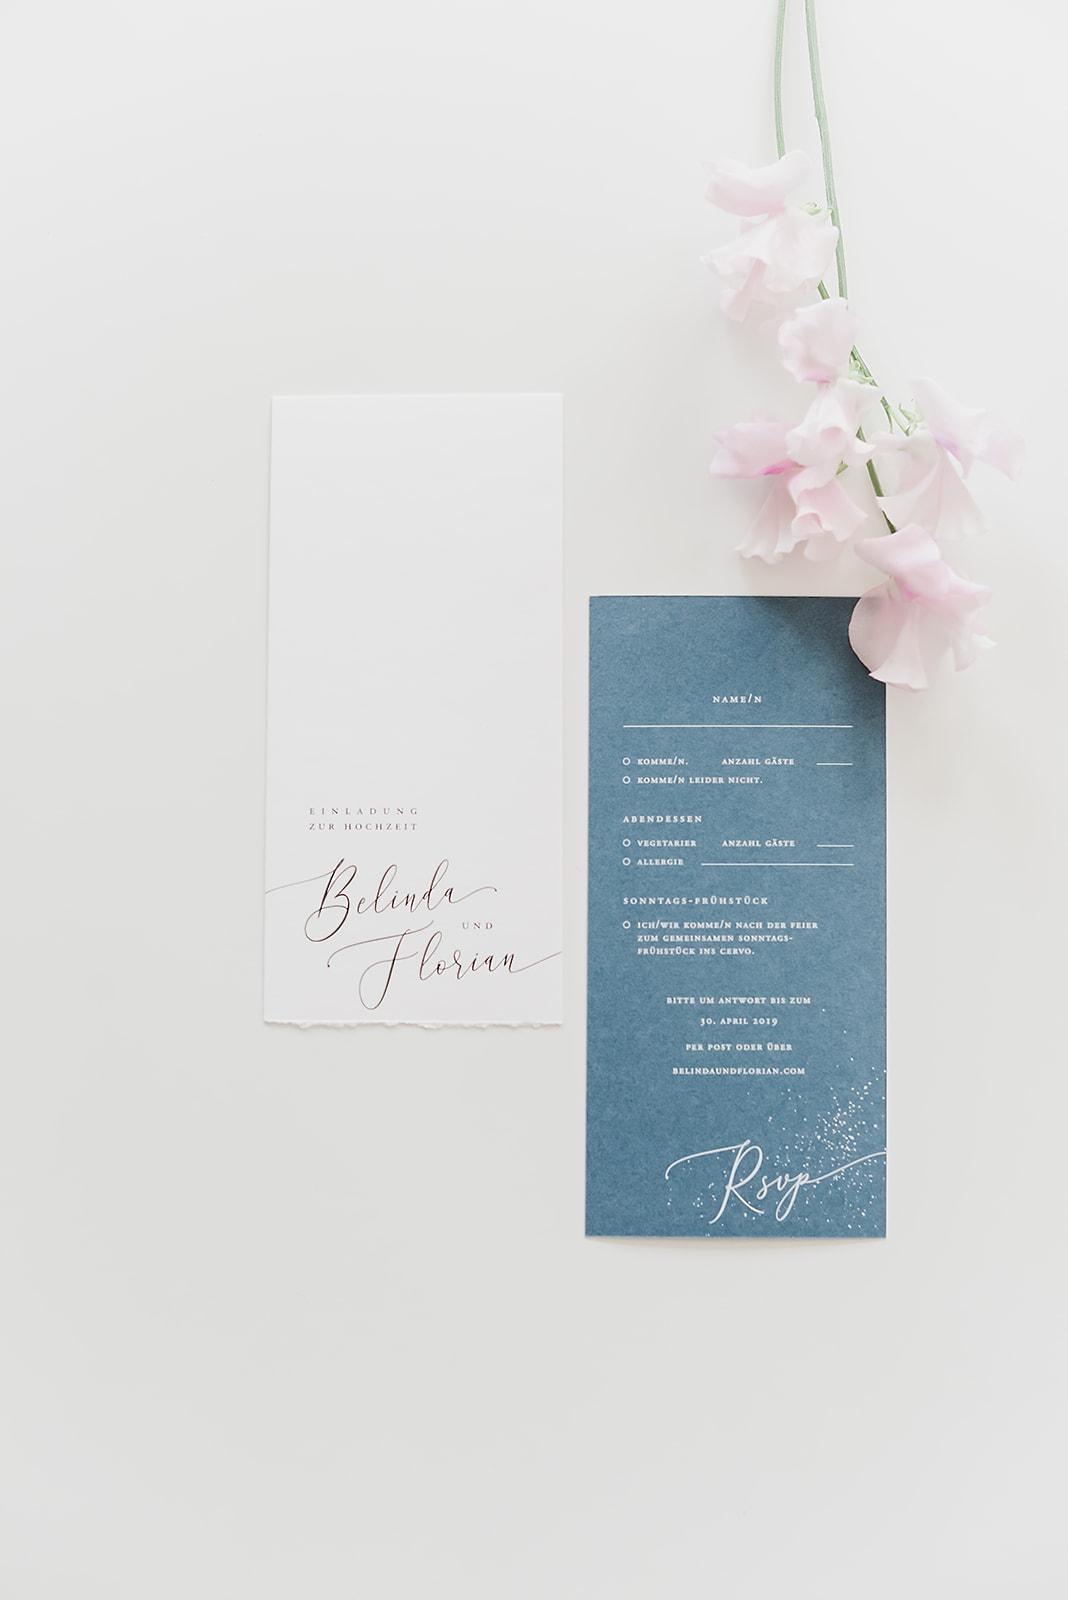 Belinda_Florian_Einladungskarte 2019.jpg